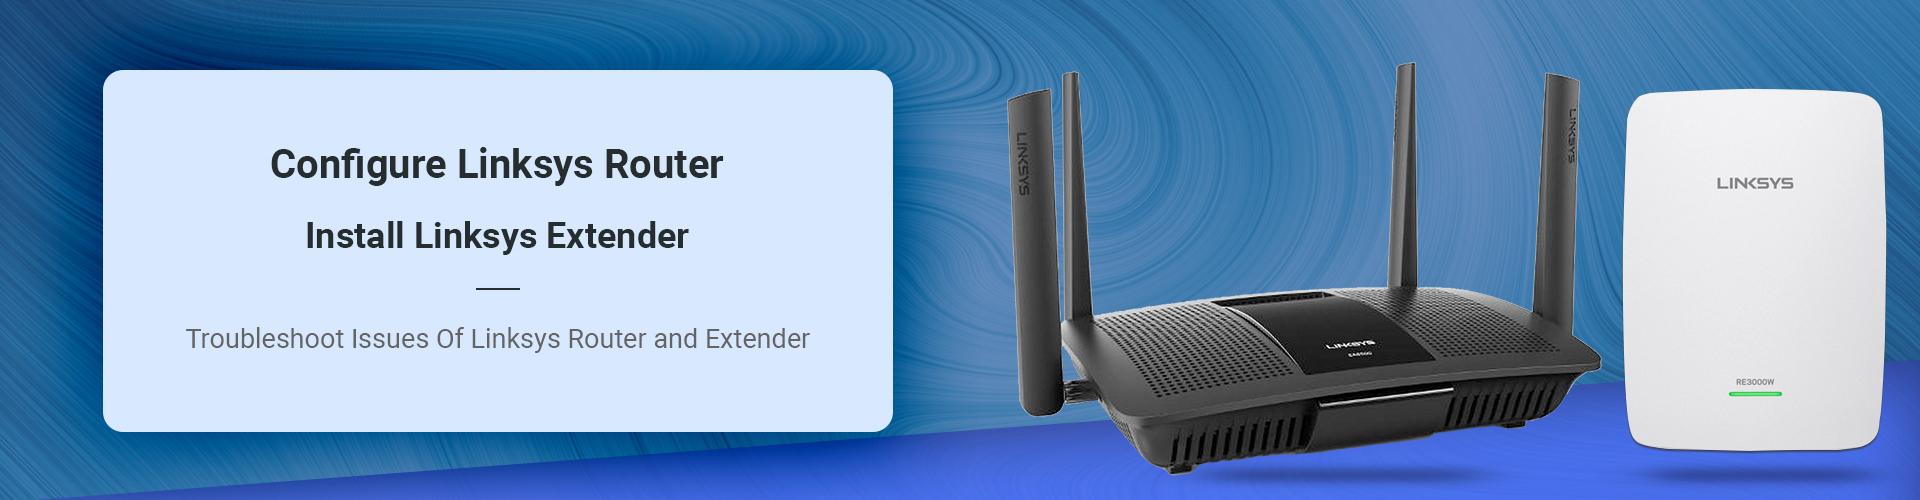 linksys router login | linksys extender setup | linksys router setup